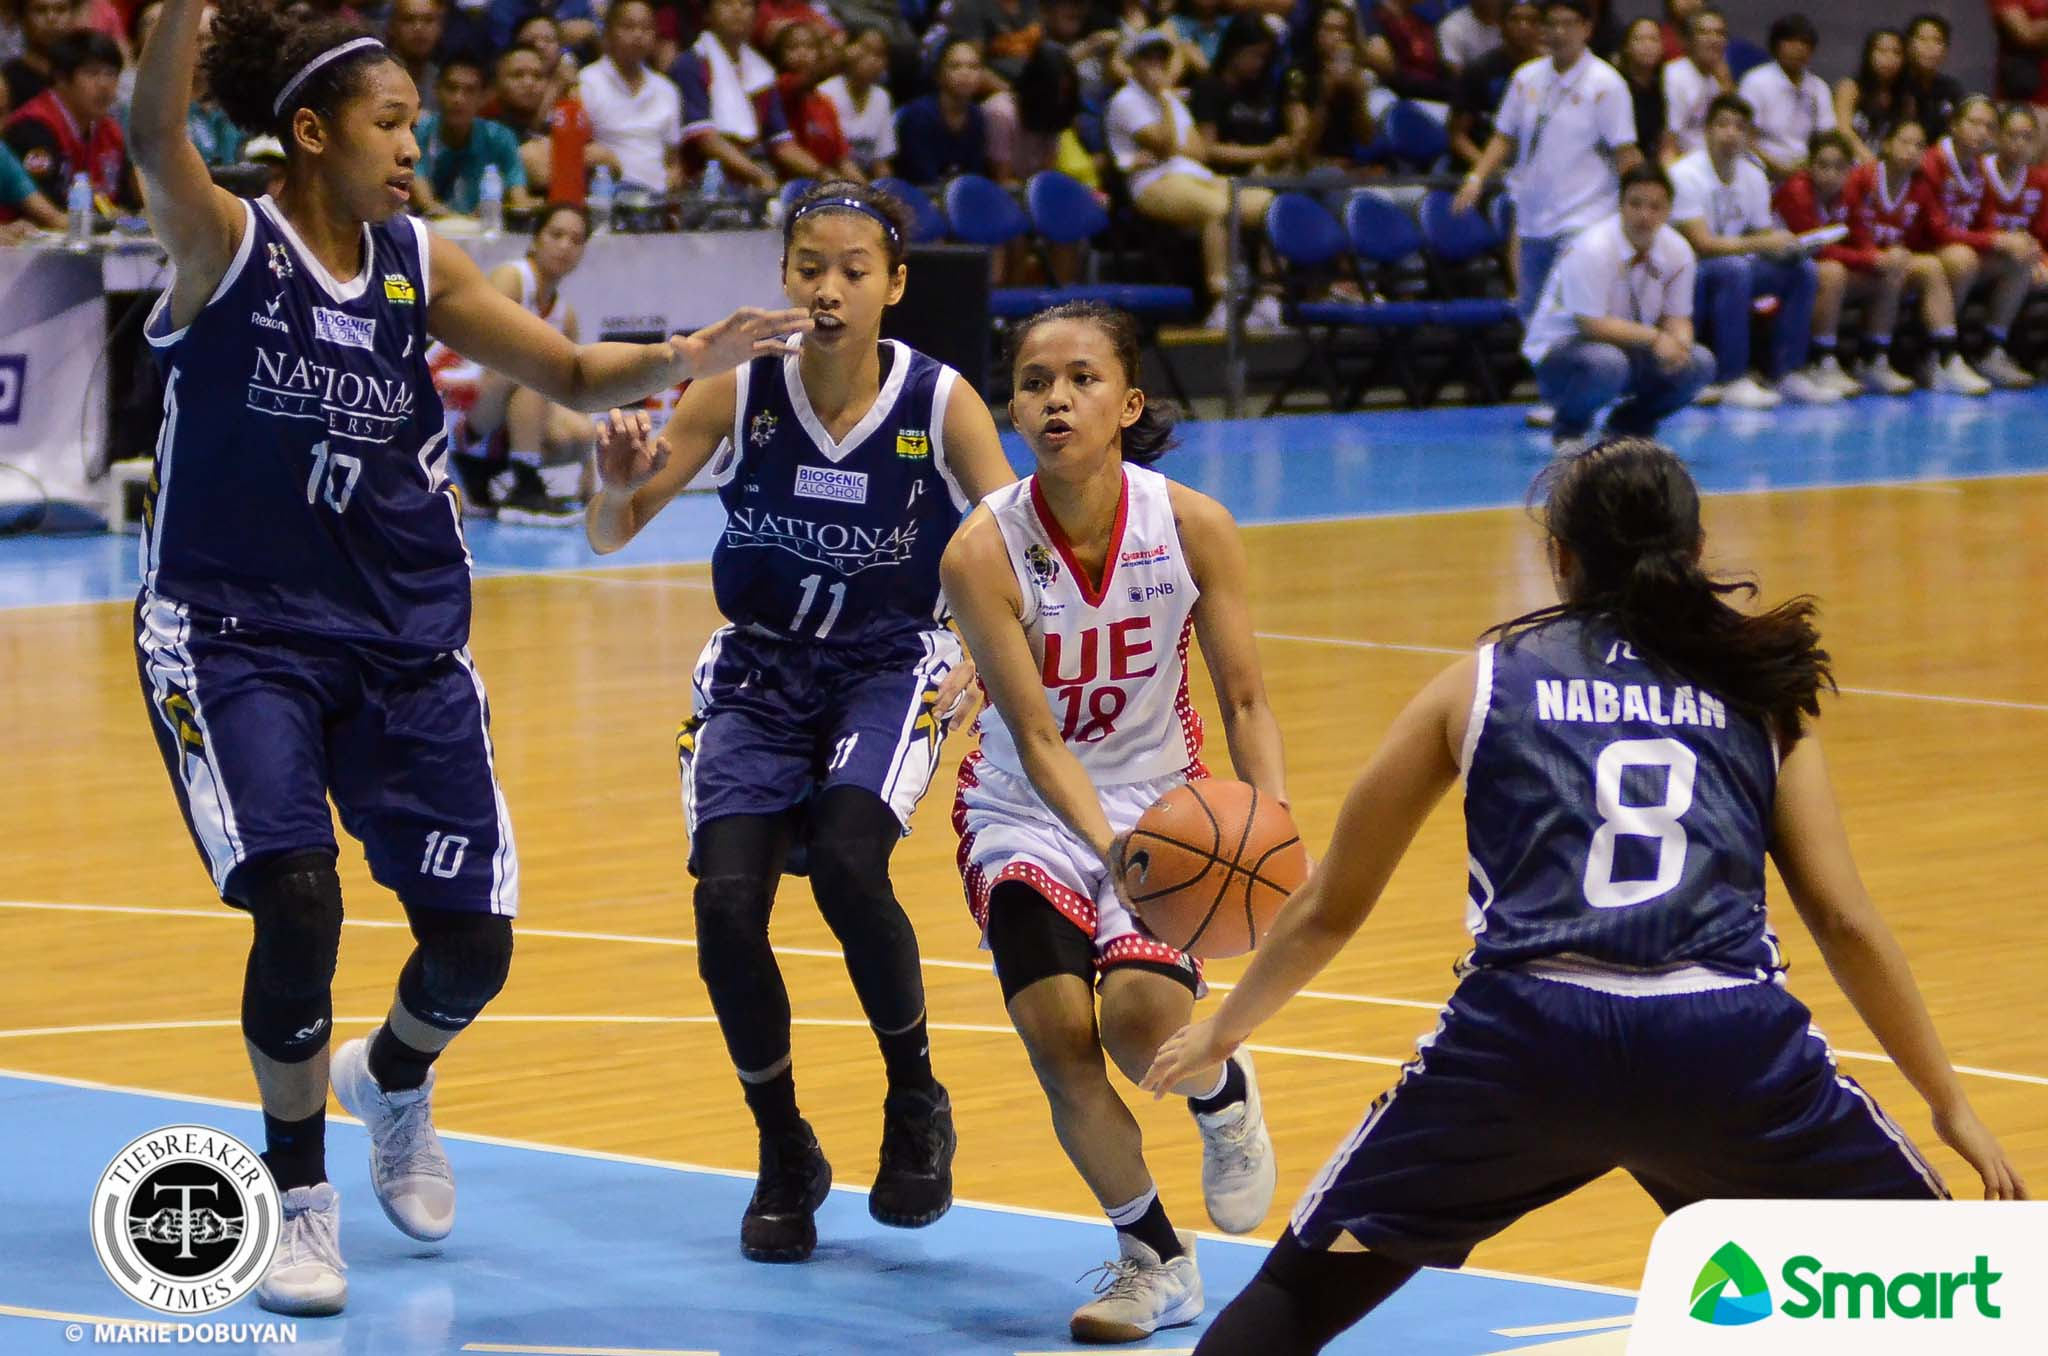 UAAP-80-Womens-Final-NU-UE-Tacula-8590 Graduating seniors, Aileen Lebornio laud valiant UE after Finals loss to NU Basketball News UAAP UE  - philippine sports news